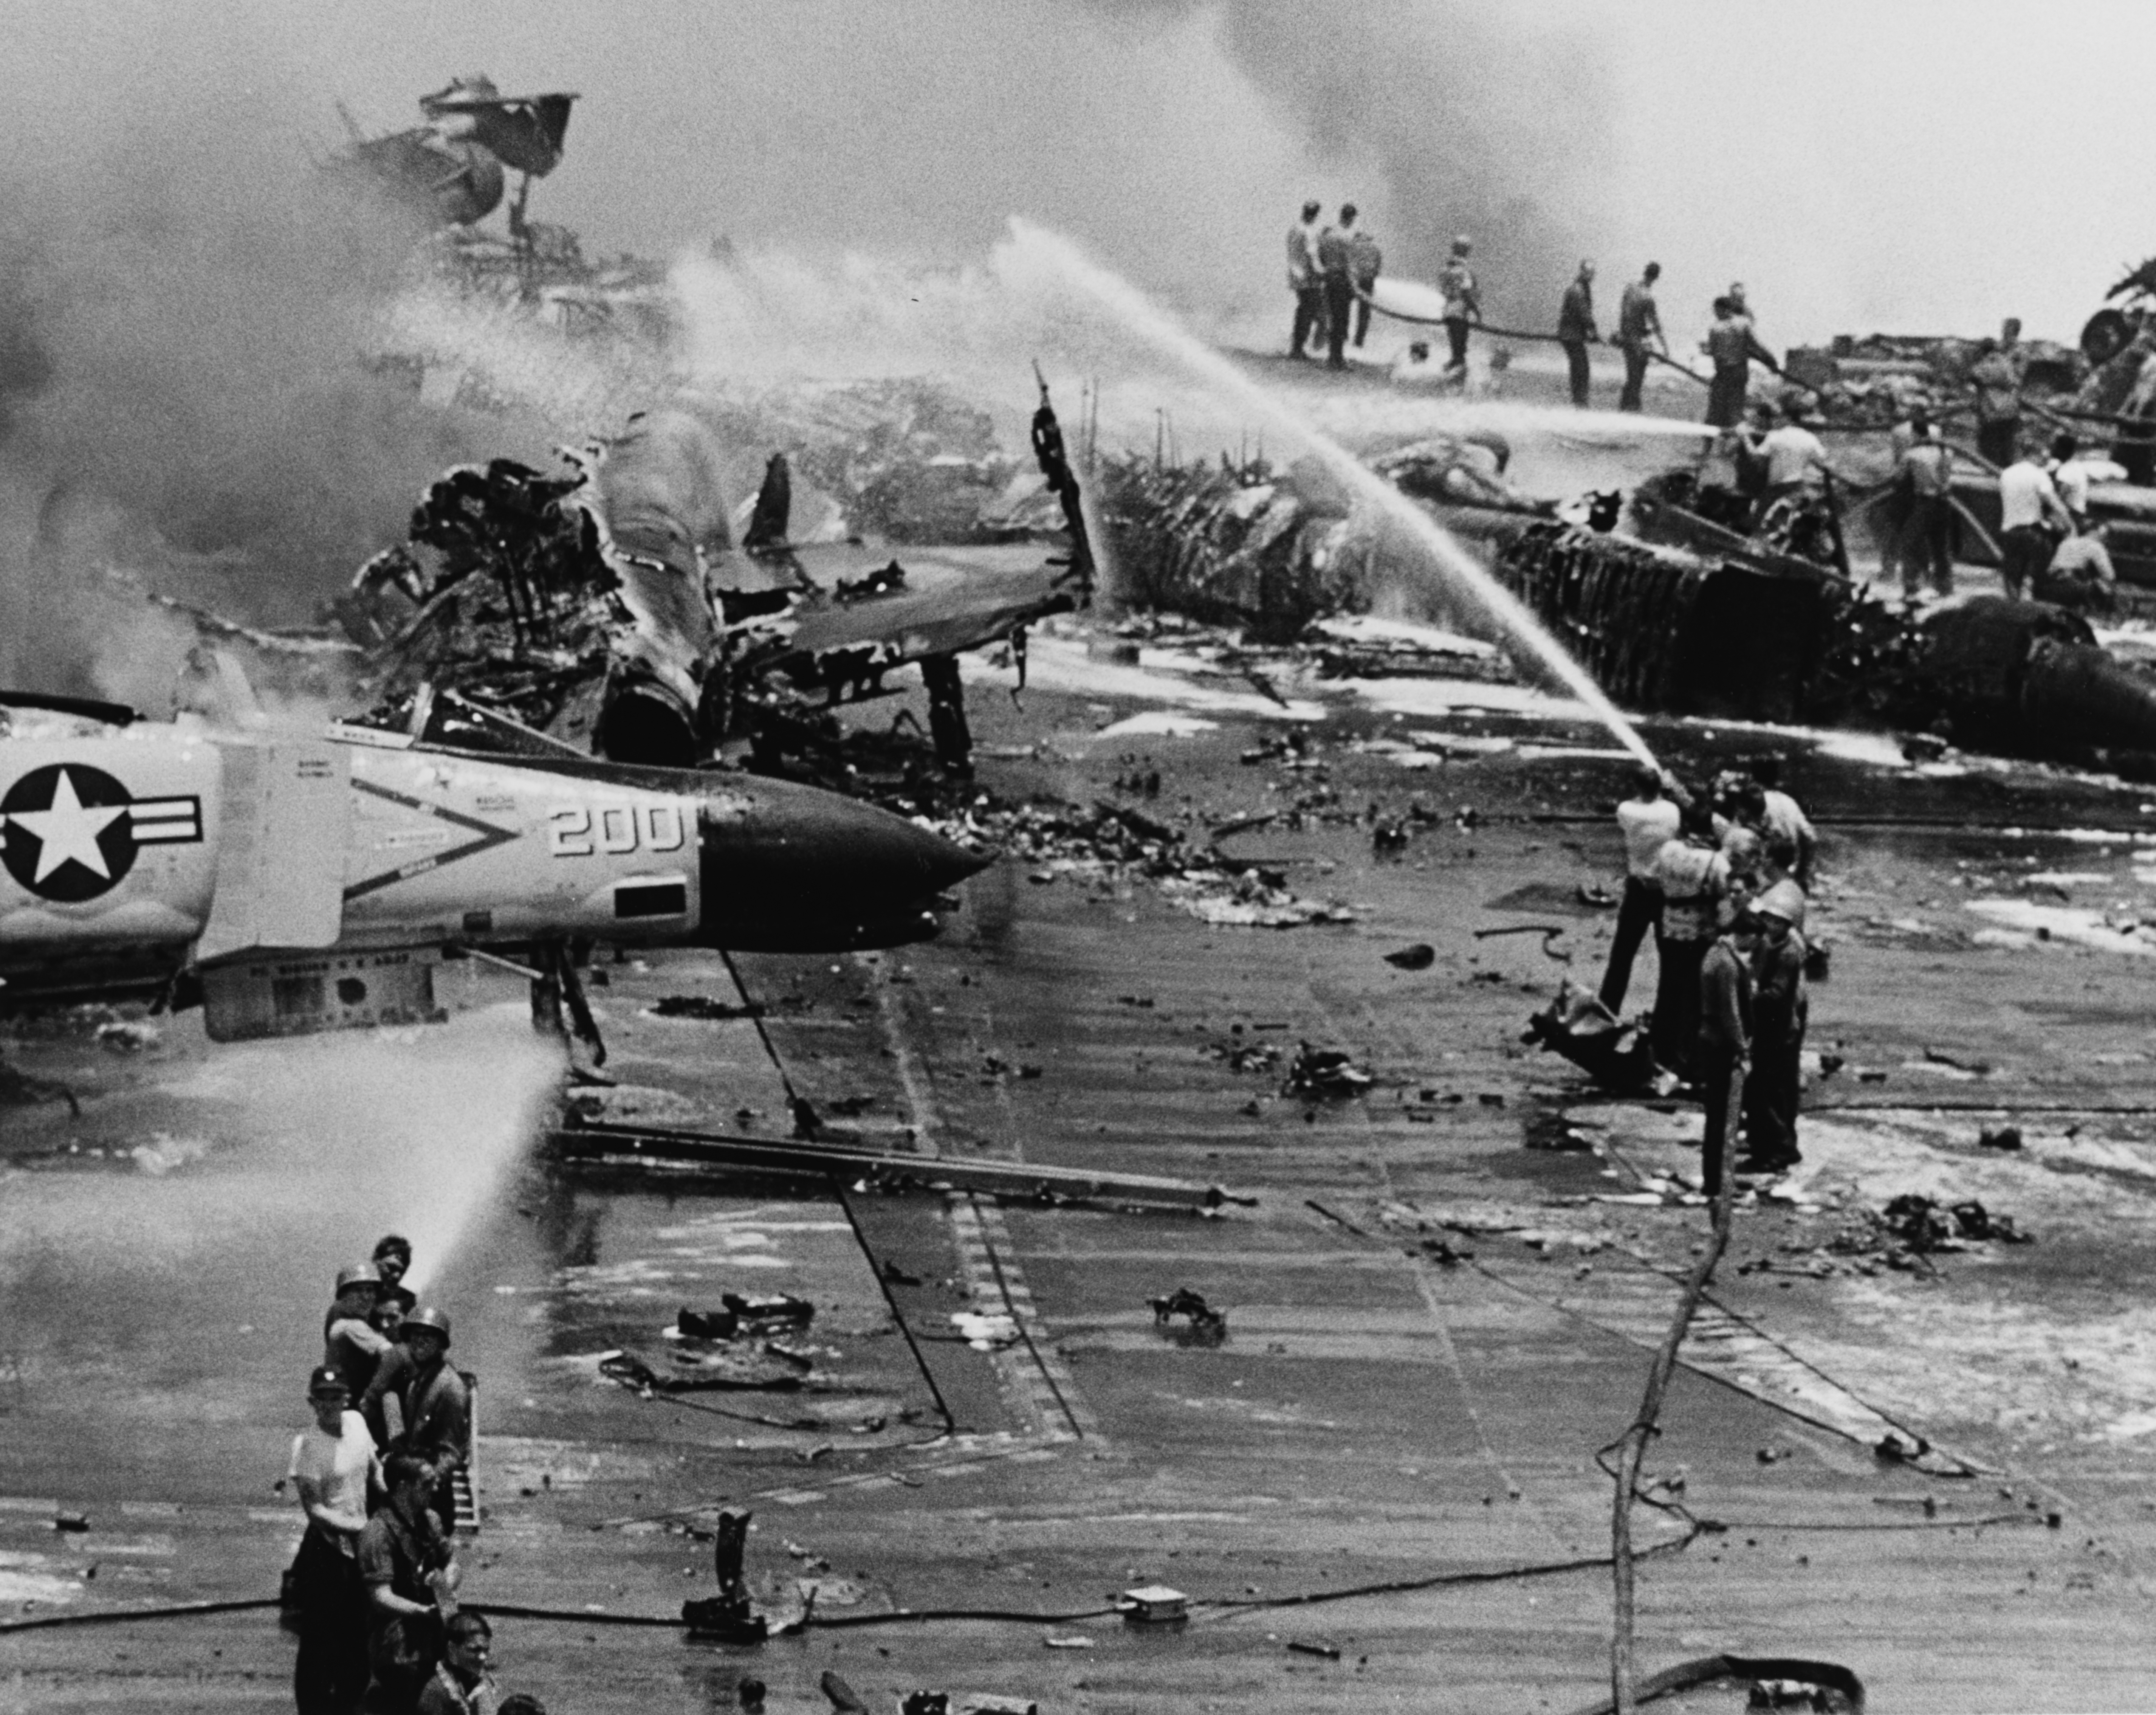 USS_Forrestal_explosion_29_July_1967.jpg